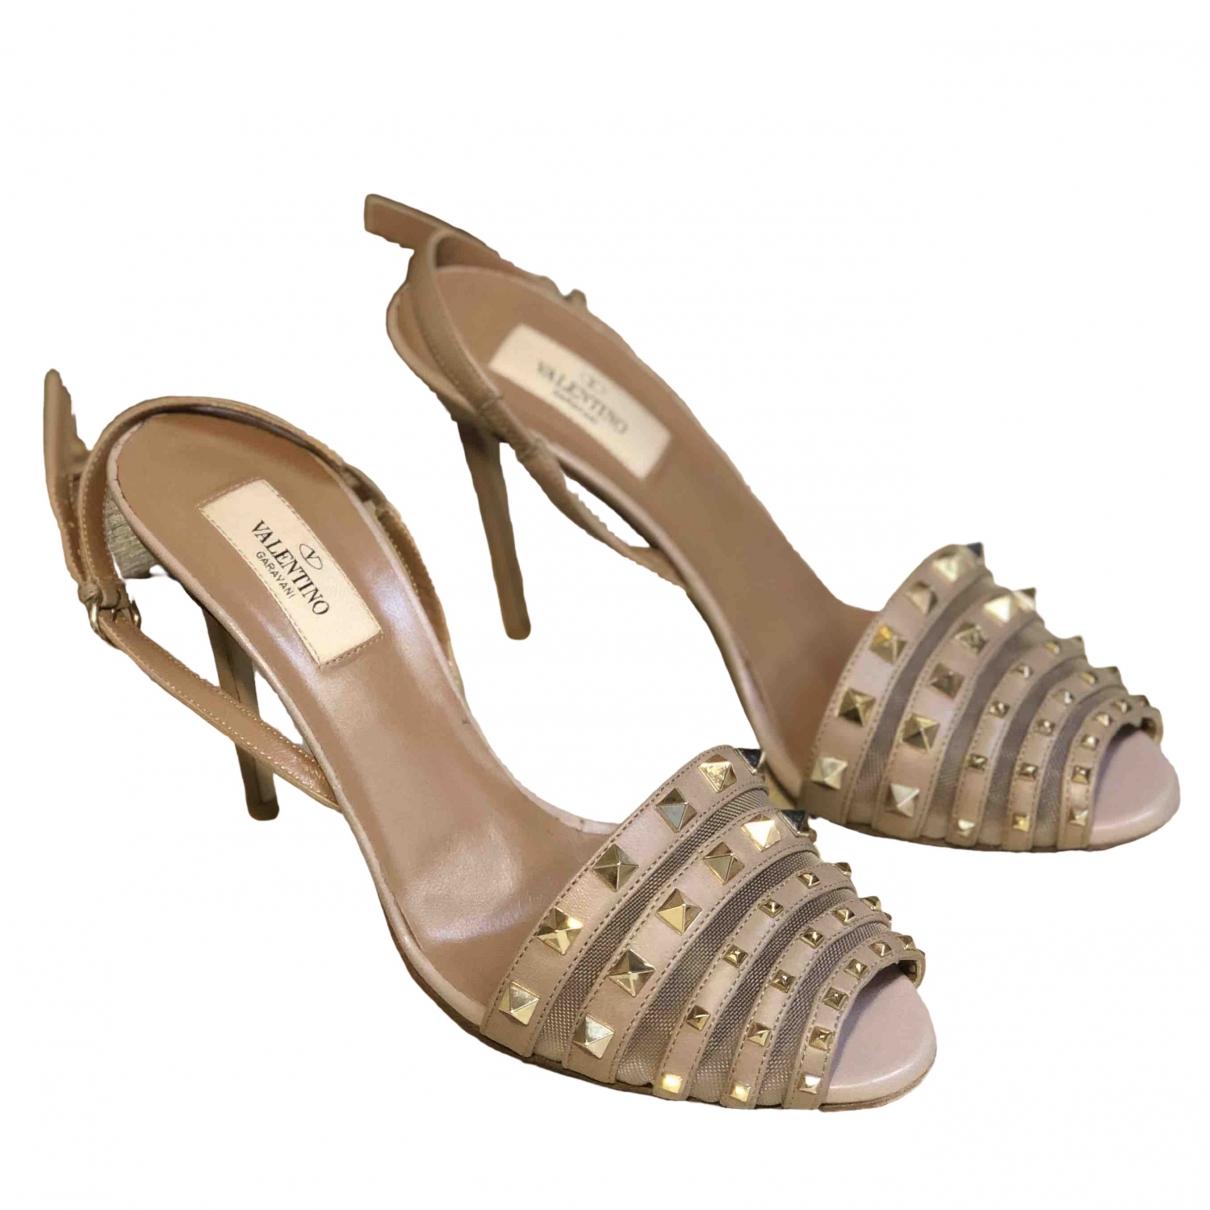 Valentino Garavani Rockstud Pink Leather Sandals for Women 39 IT